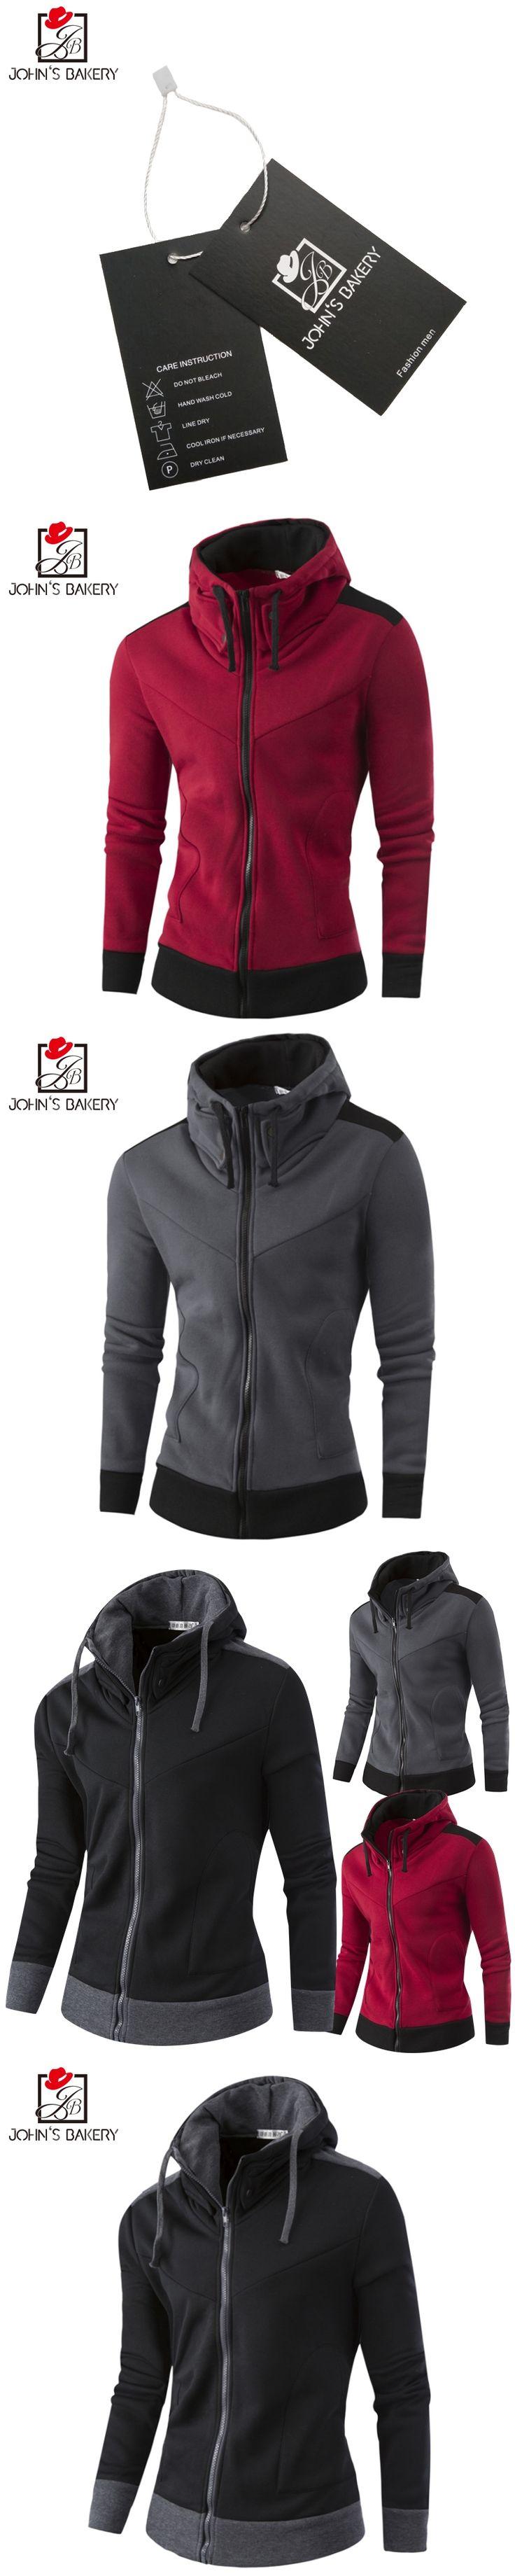 2017 New Mens Hoodies and Sweatshirts Zipper Hooded Sweatshirts Male Clothing Fashion Military Hoody For Men Hit color Hoodies X